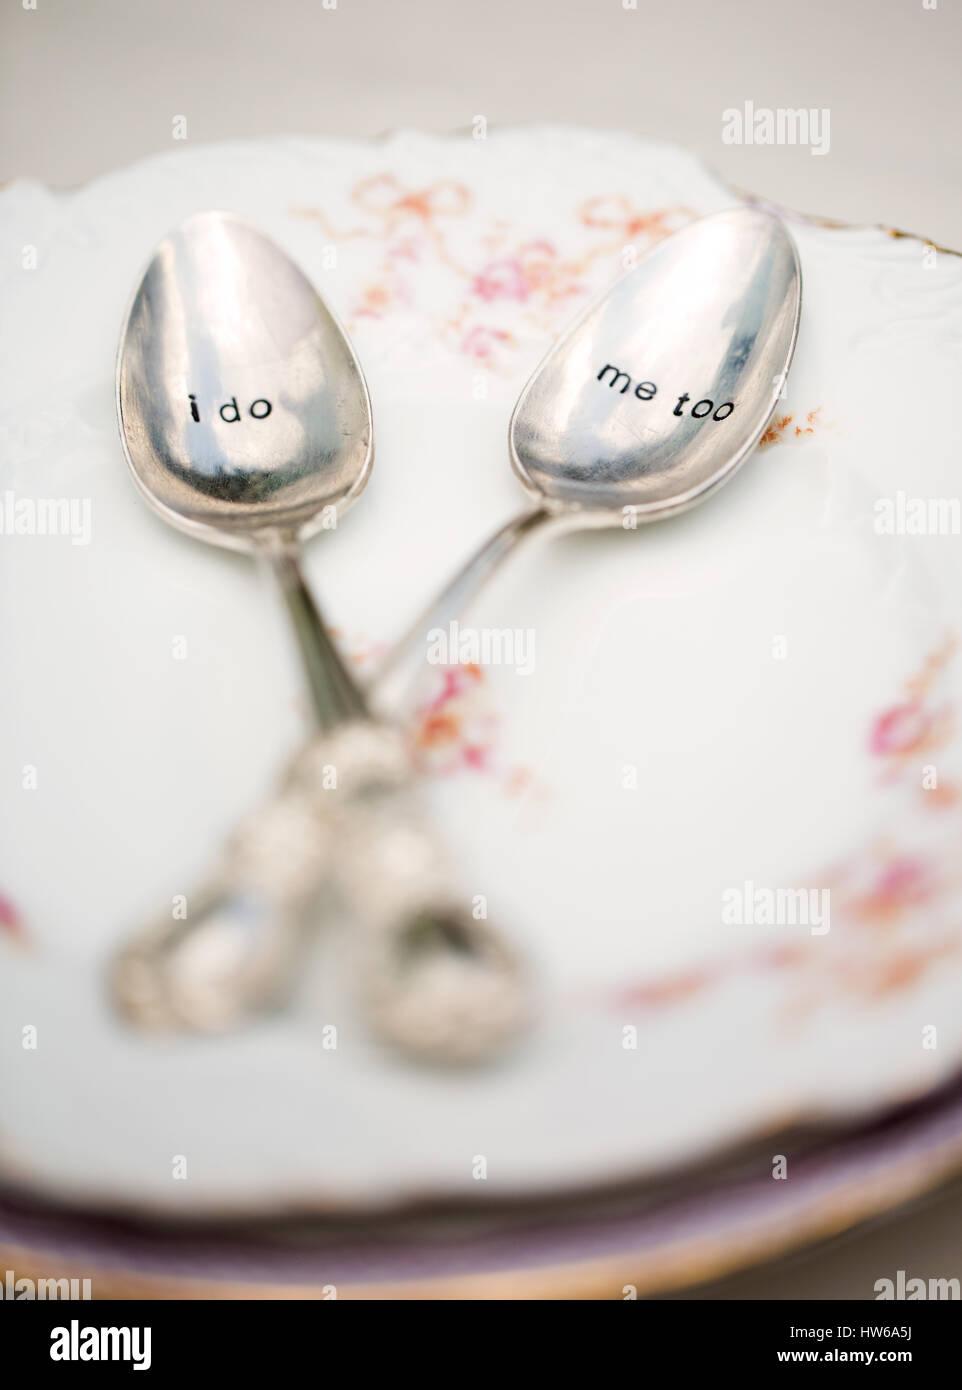 Bride and groom's teaspoons ('I do' 'me too') - Stock Image